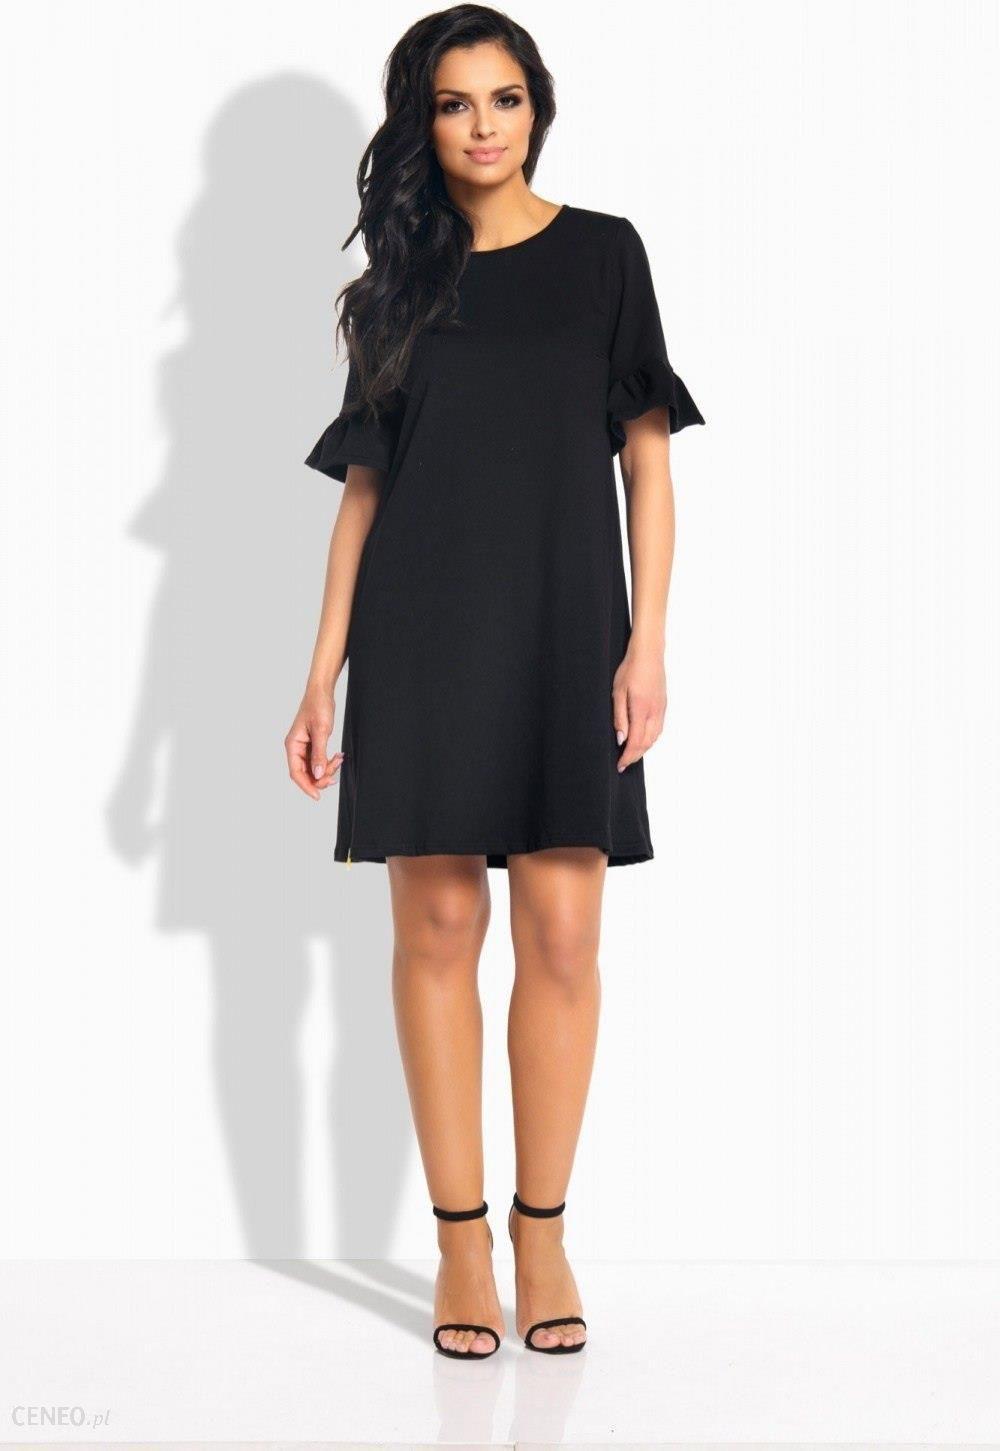 a5d03bba4b Lemoniade Sukienka Model L188 Black - Ceny i opinie - Ceneo.pl